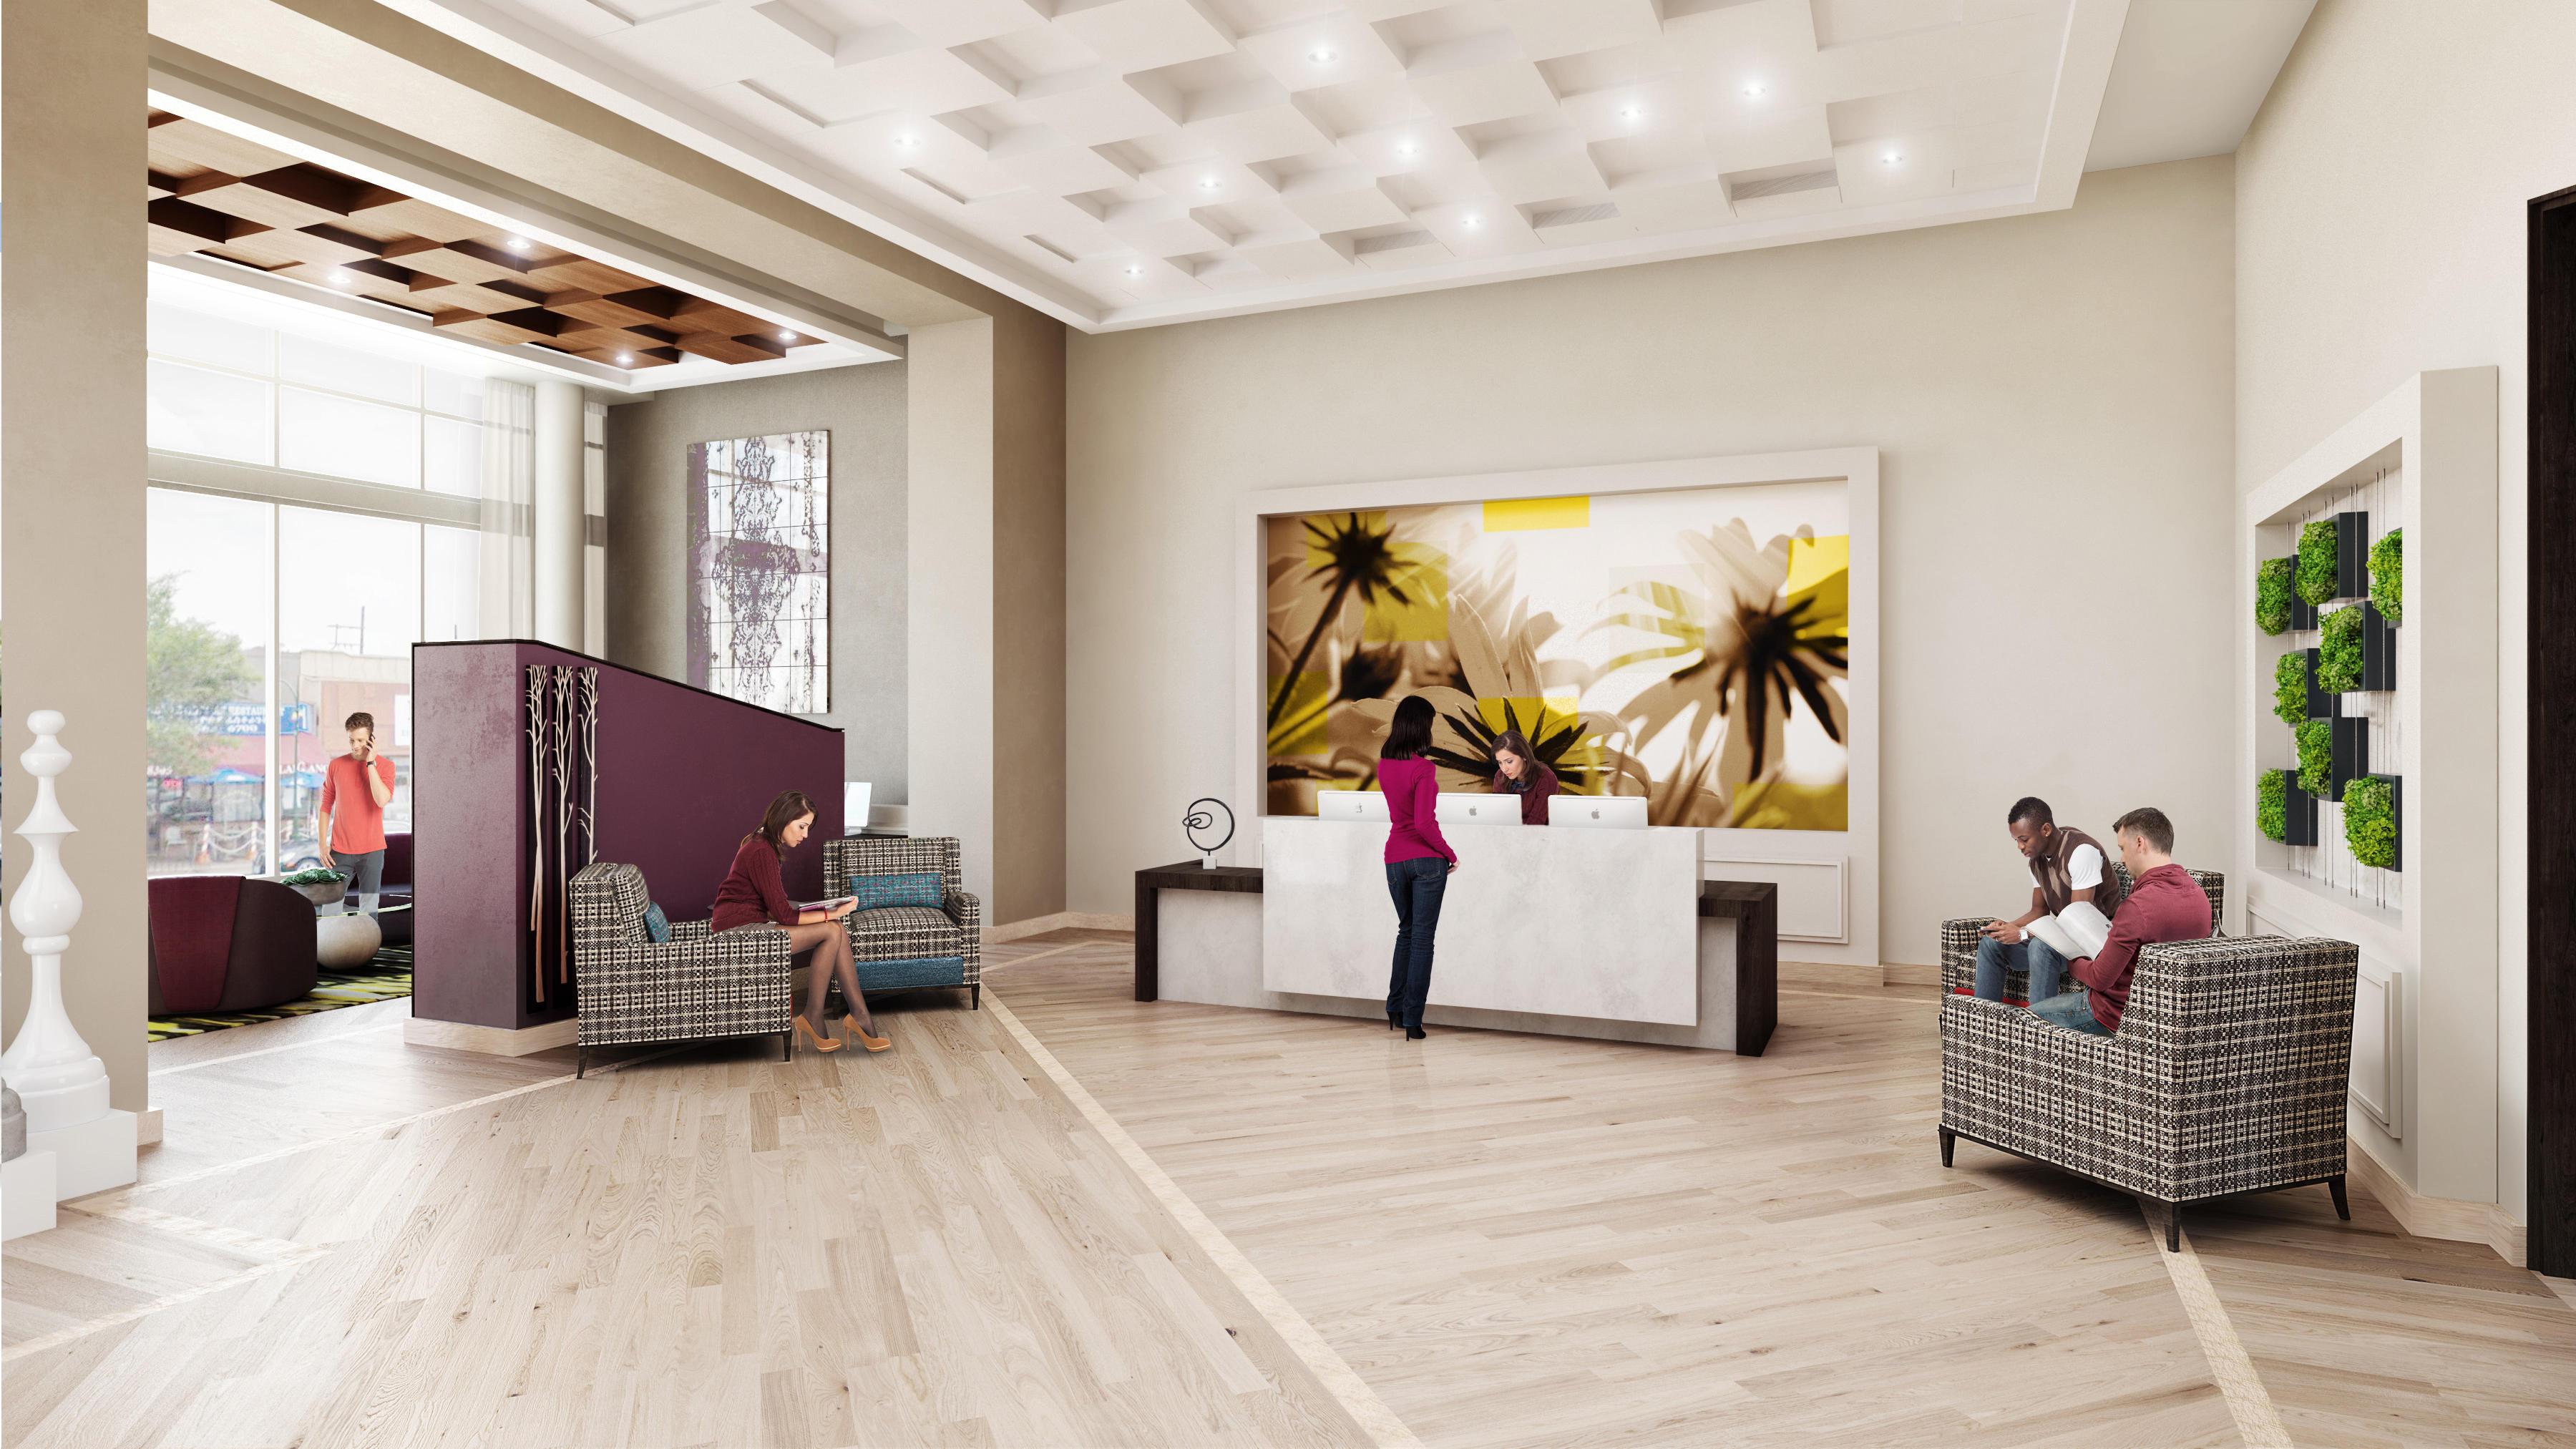 Solaire 8250 Apartments image 3